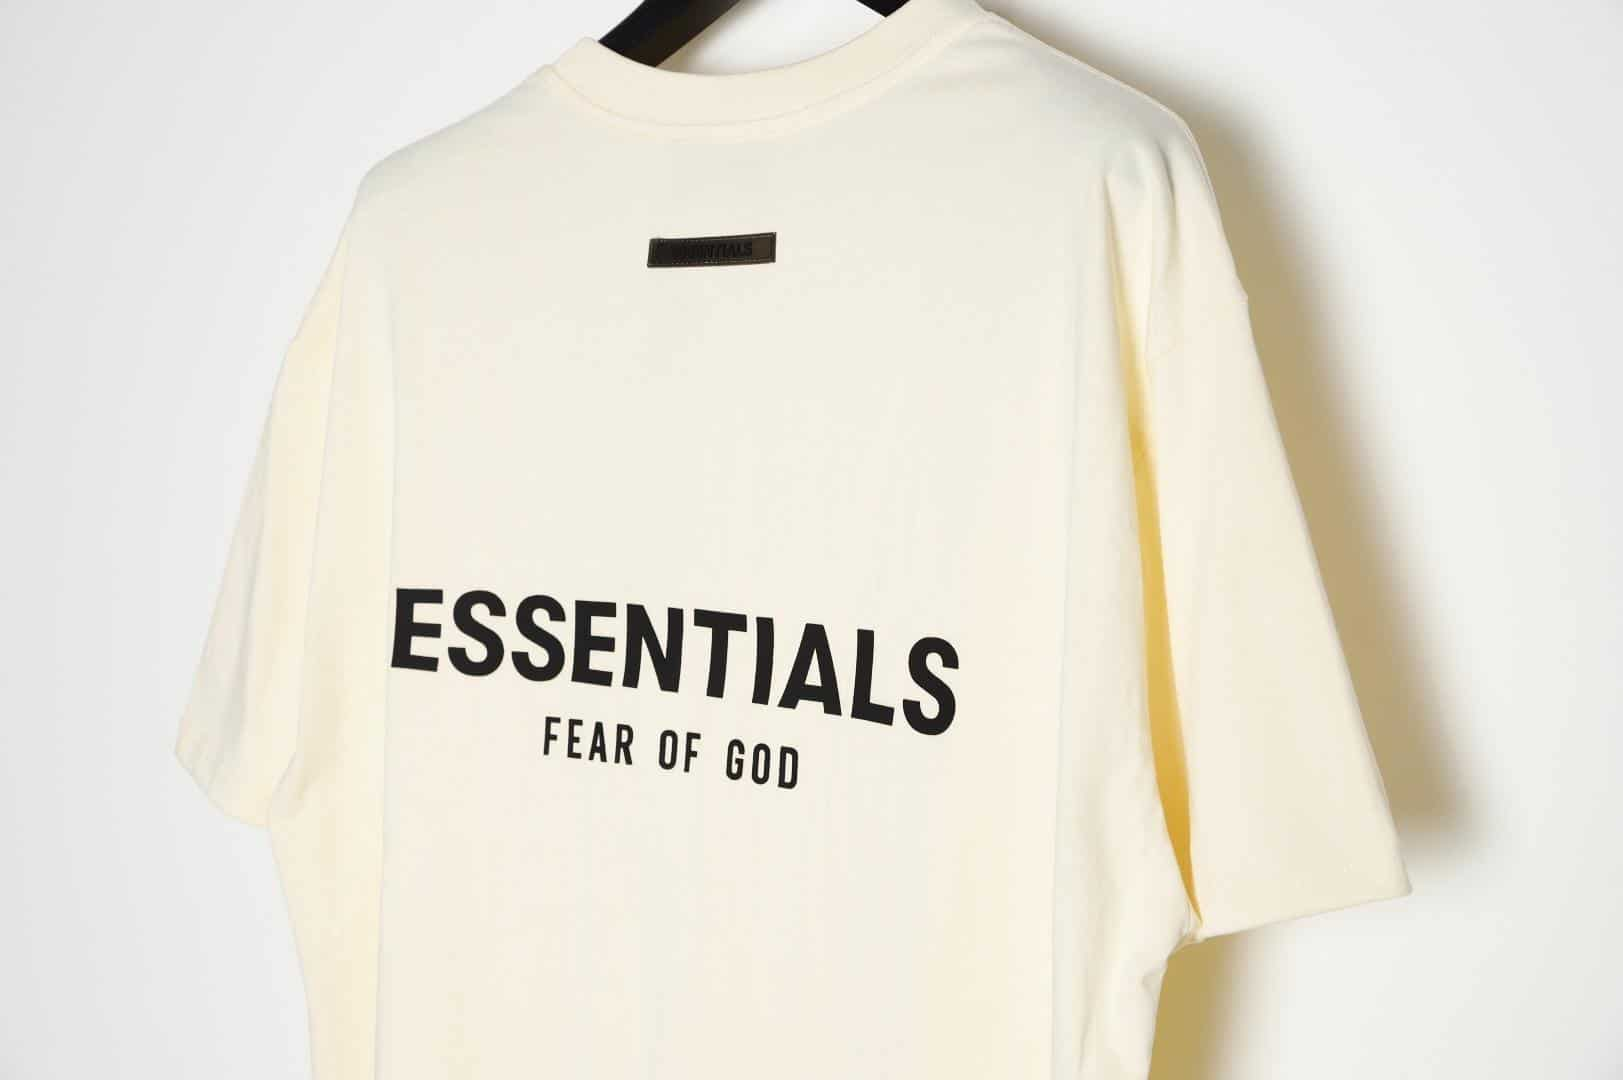 replica vs authentic fear of god essentials tee